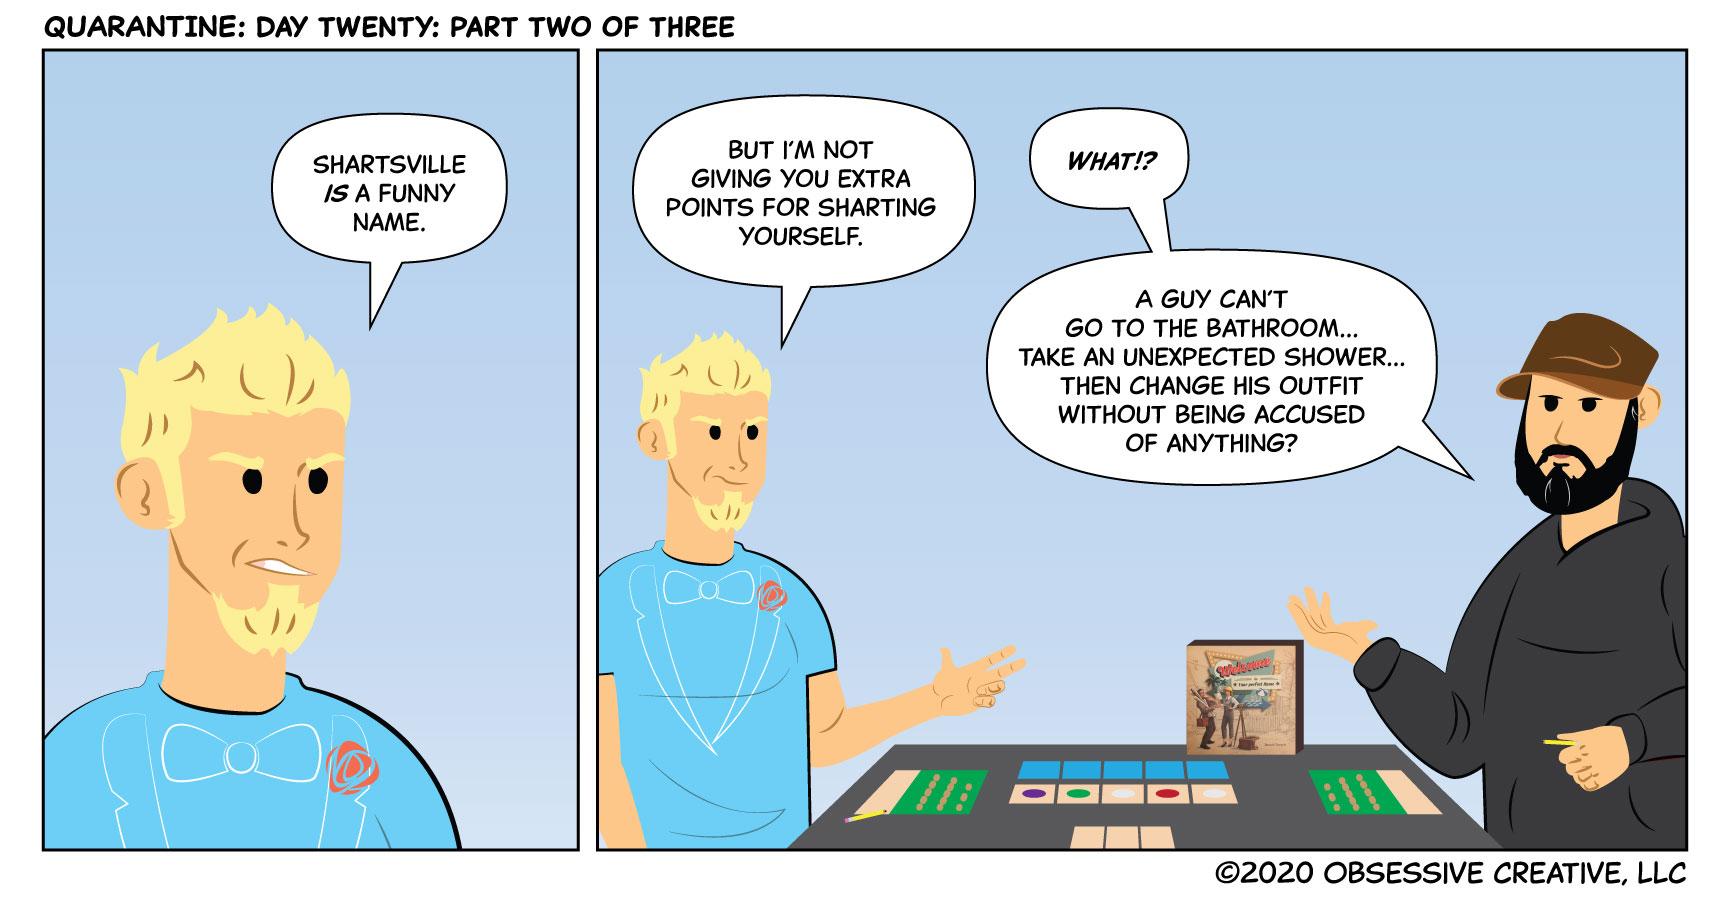 QUARANTINE: Day Twenty: Part Two of Three